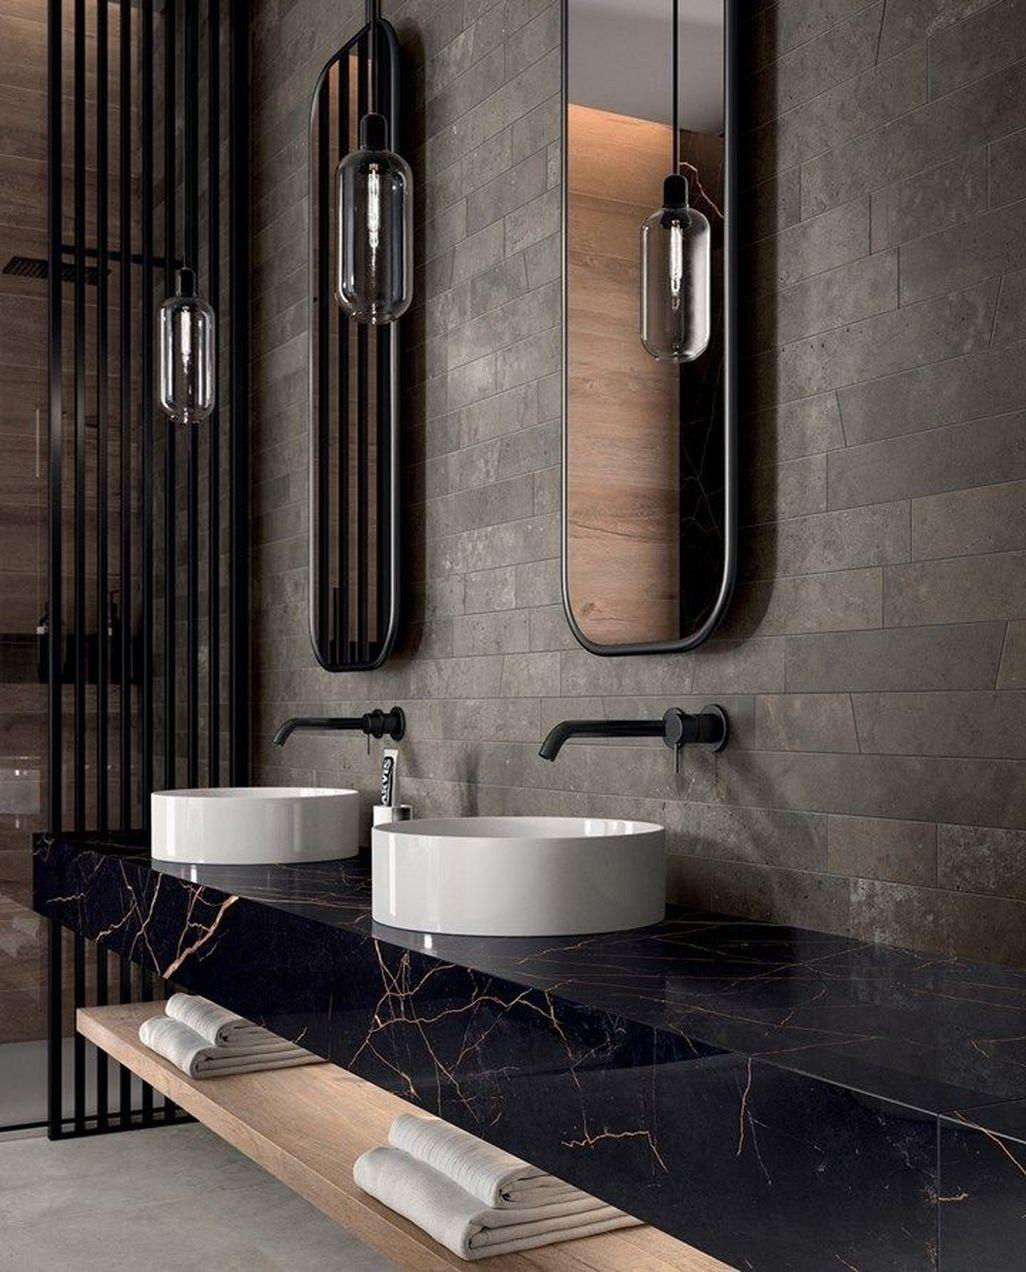 47 Modern Contemporary Bathroom Design Ideas Modern Contemporary Bathrooms Contemporary Bathroom Designs Modern Bathroom Design